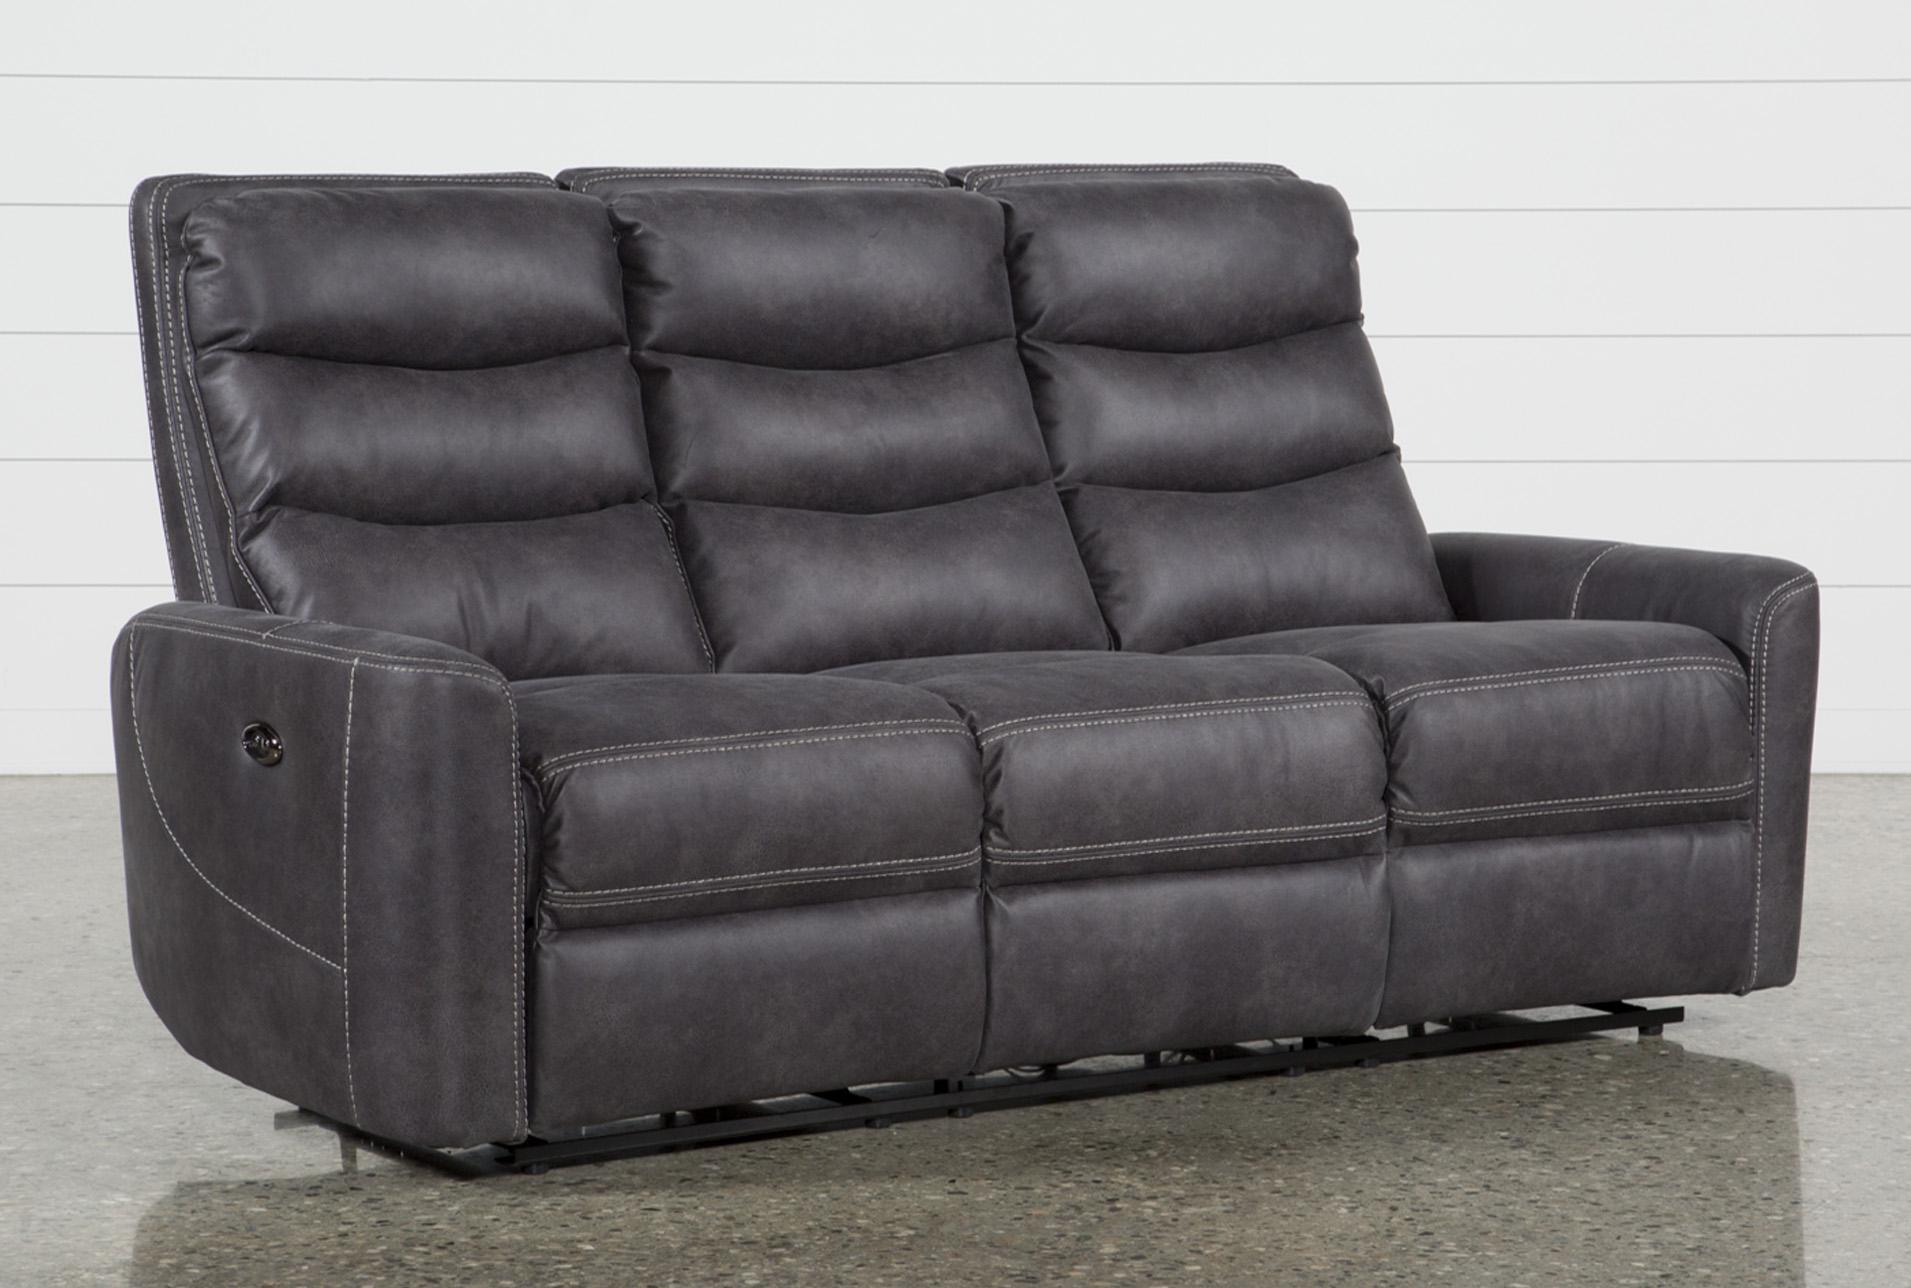 Malia Power Reclining Sofa With Usb